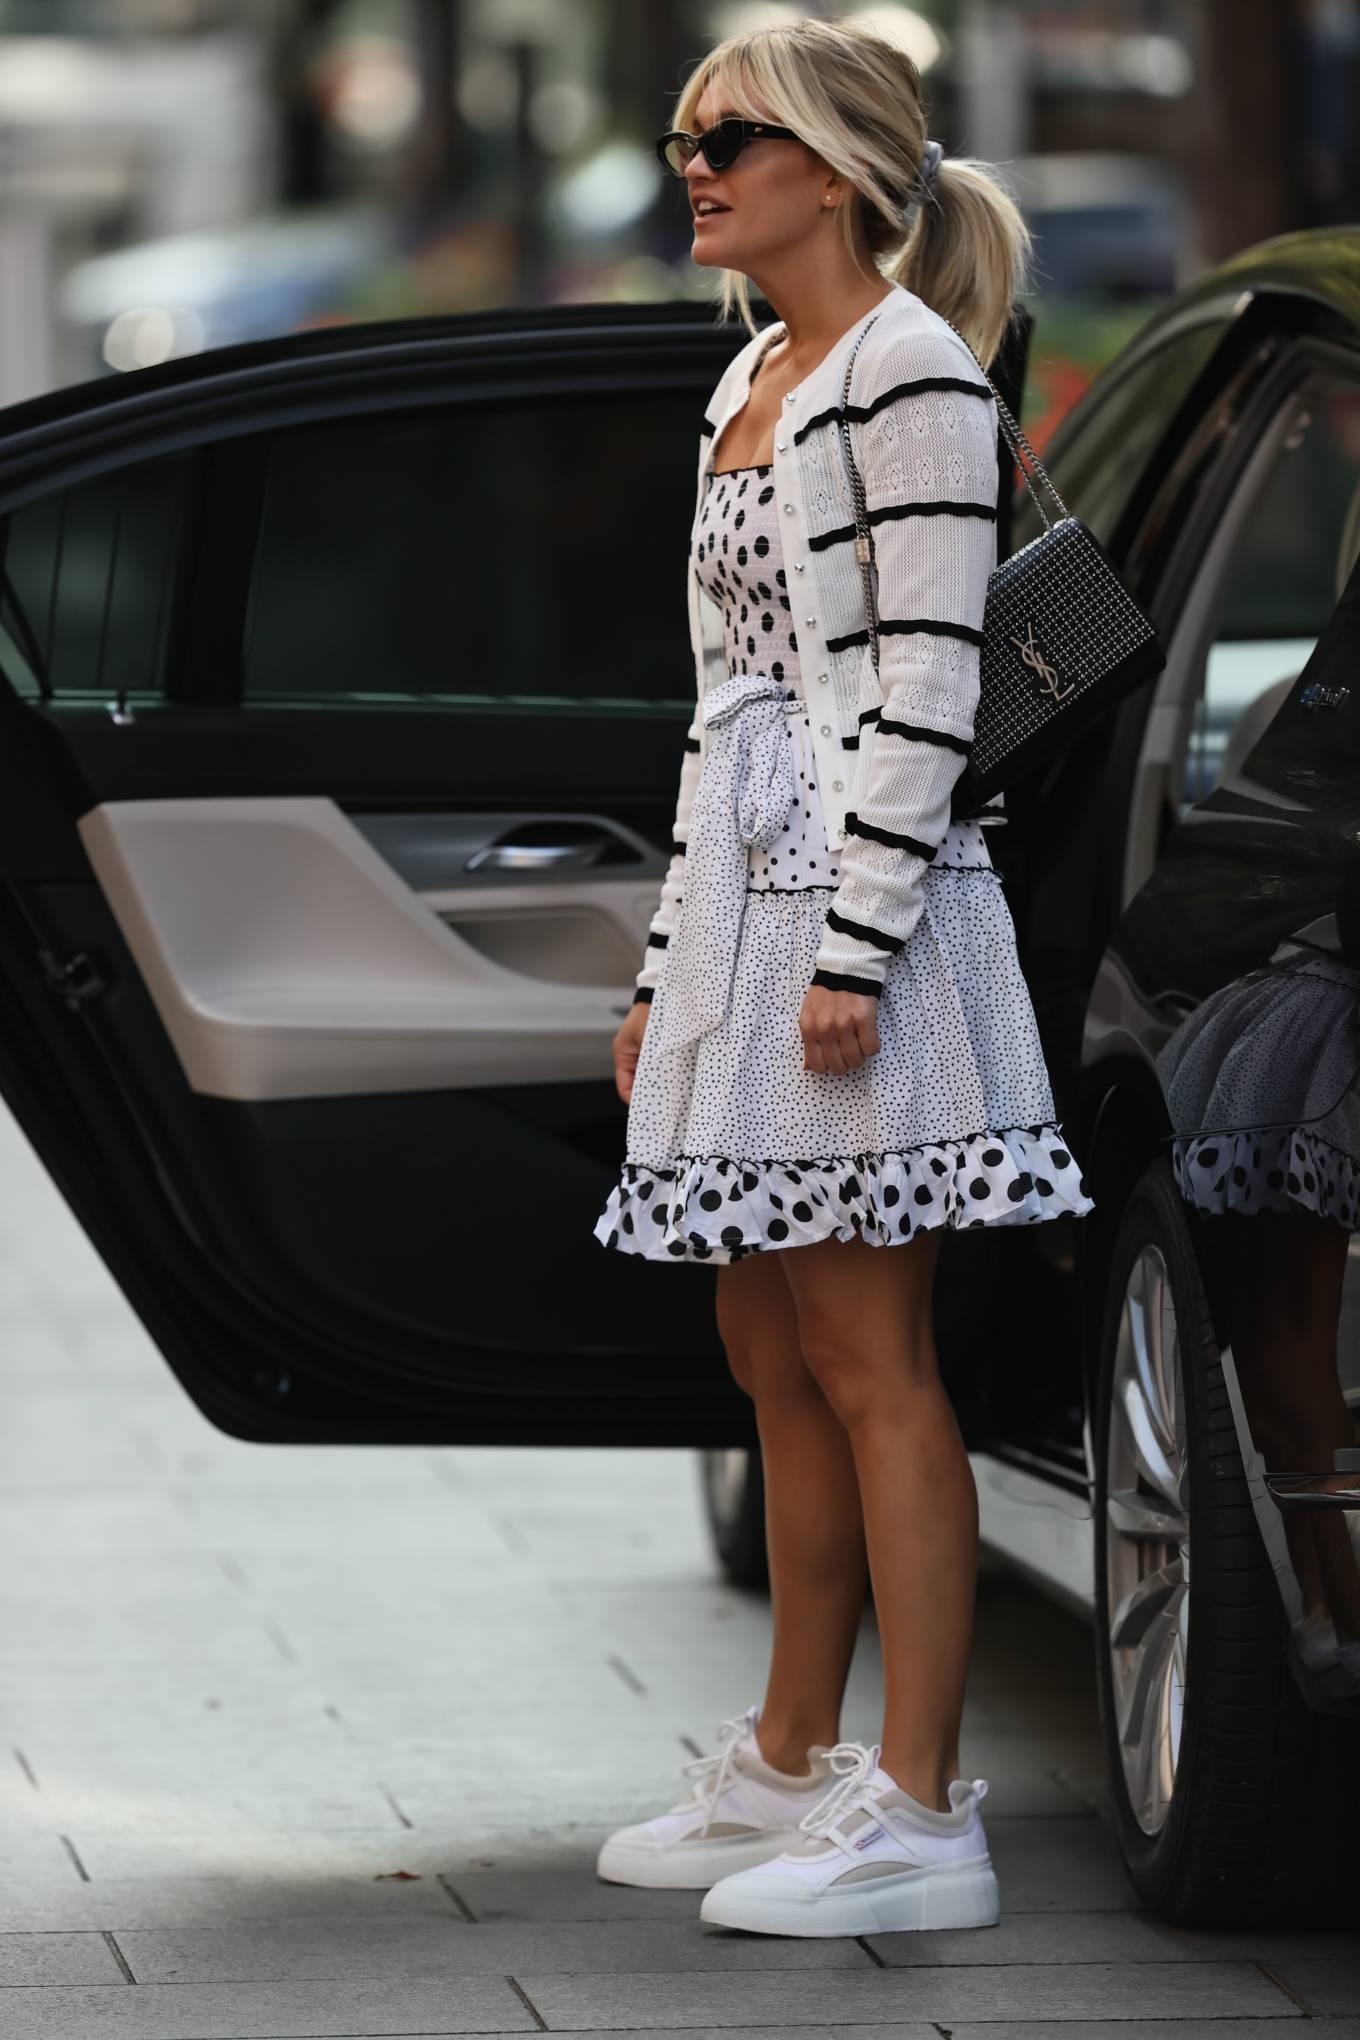 Ashley Roberts 2020 : Ashley Roberts – Wears White Polka Dot dress in London-07